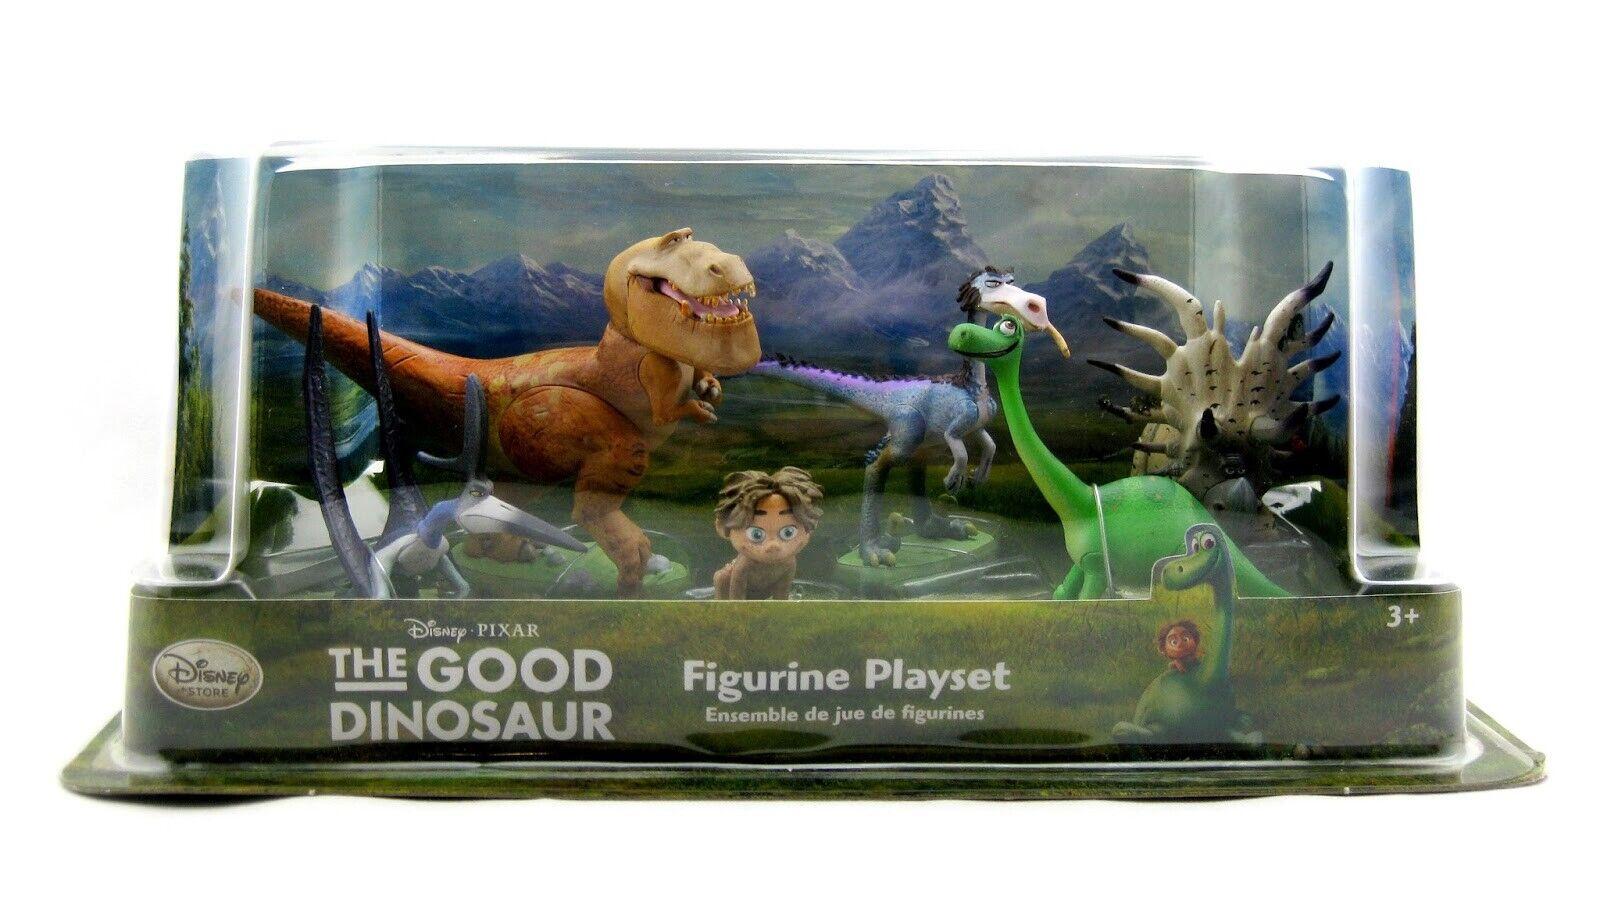 The Good Dinosaur 6 Piece Figure Play Set      N 2240